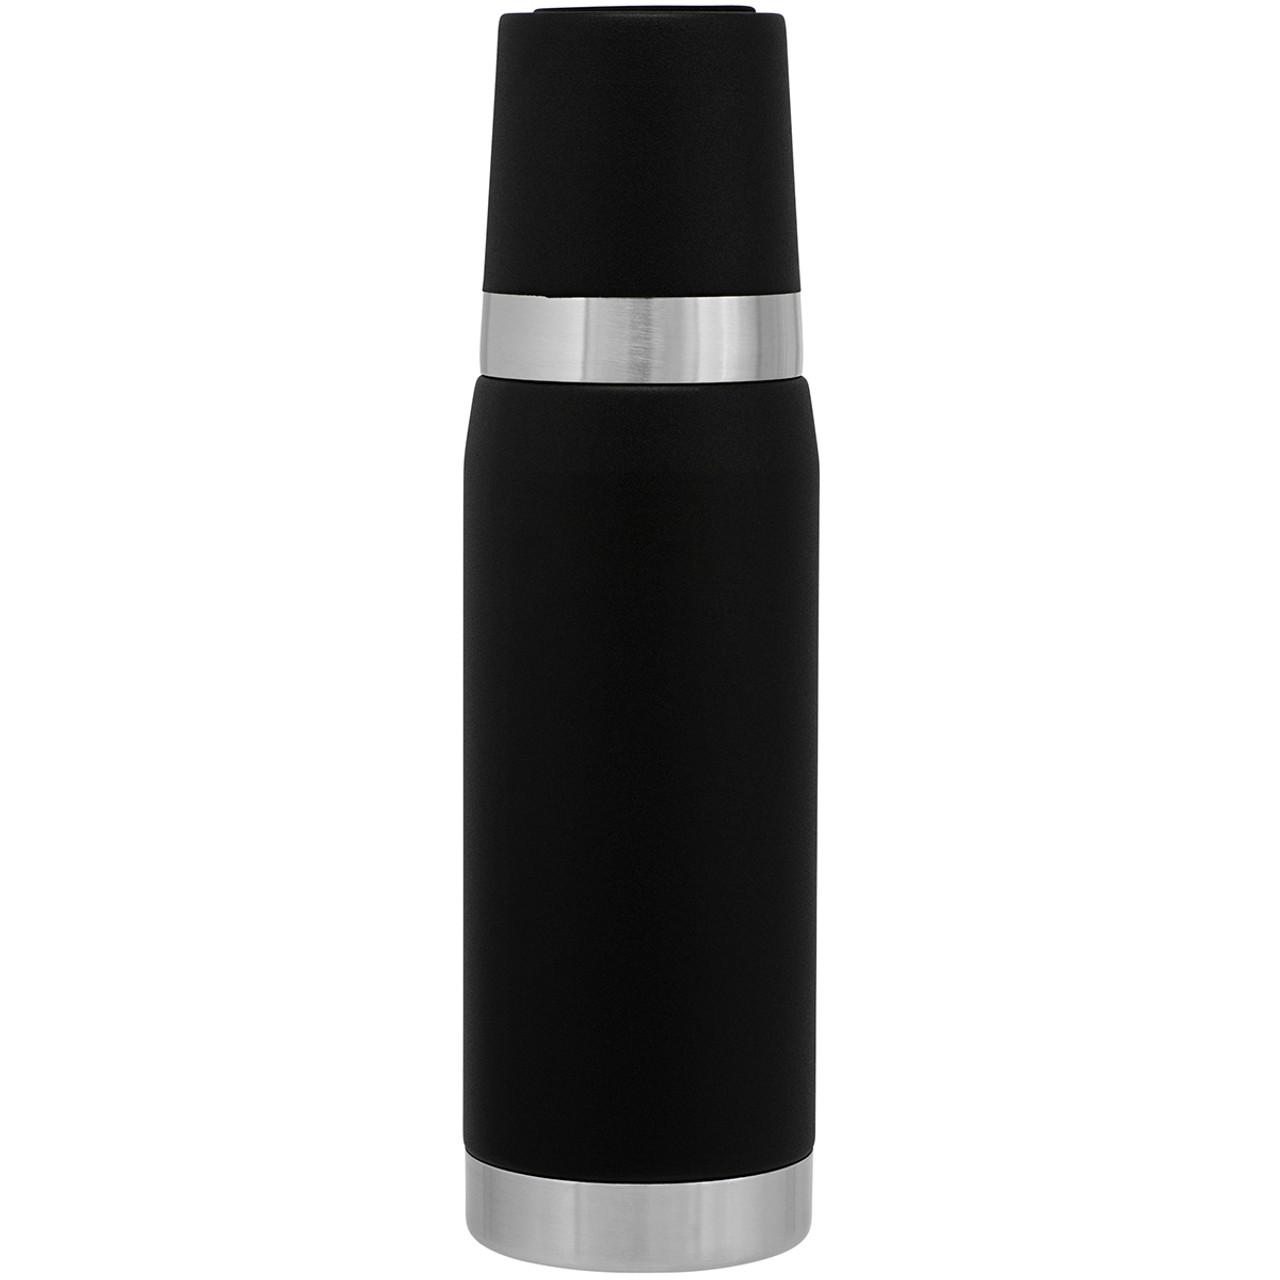 Contigo 25 oz Black Thermalock Stainless Steel Travel Thermal Bottle